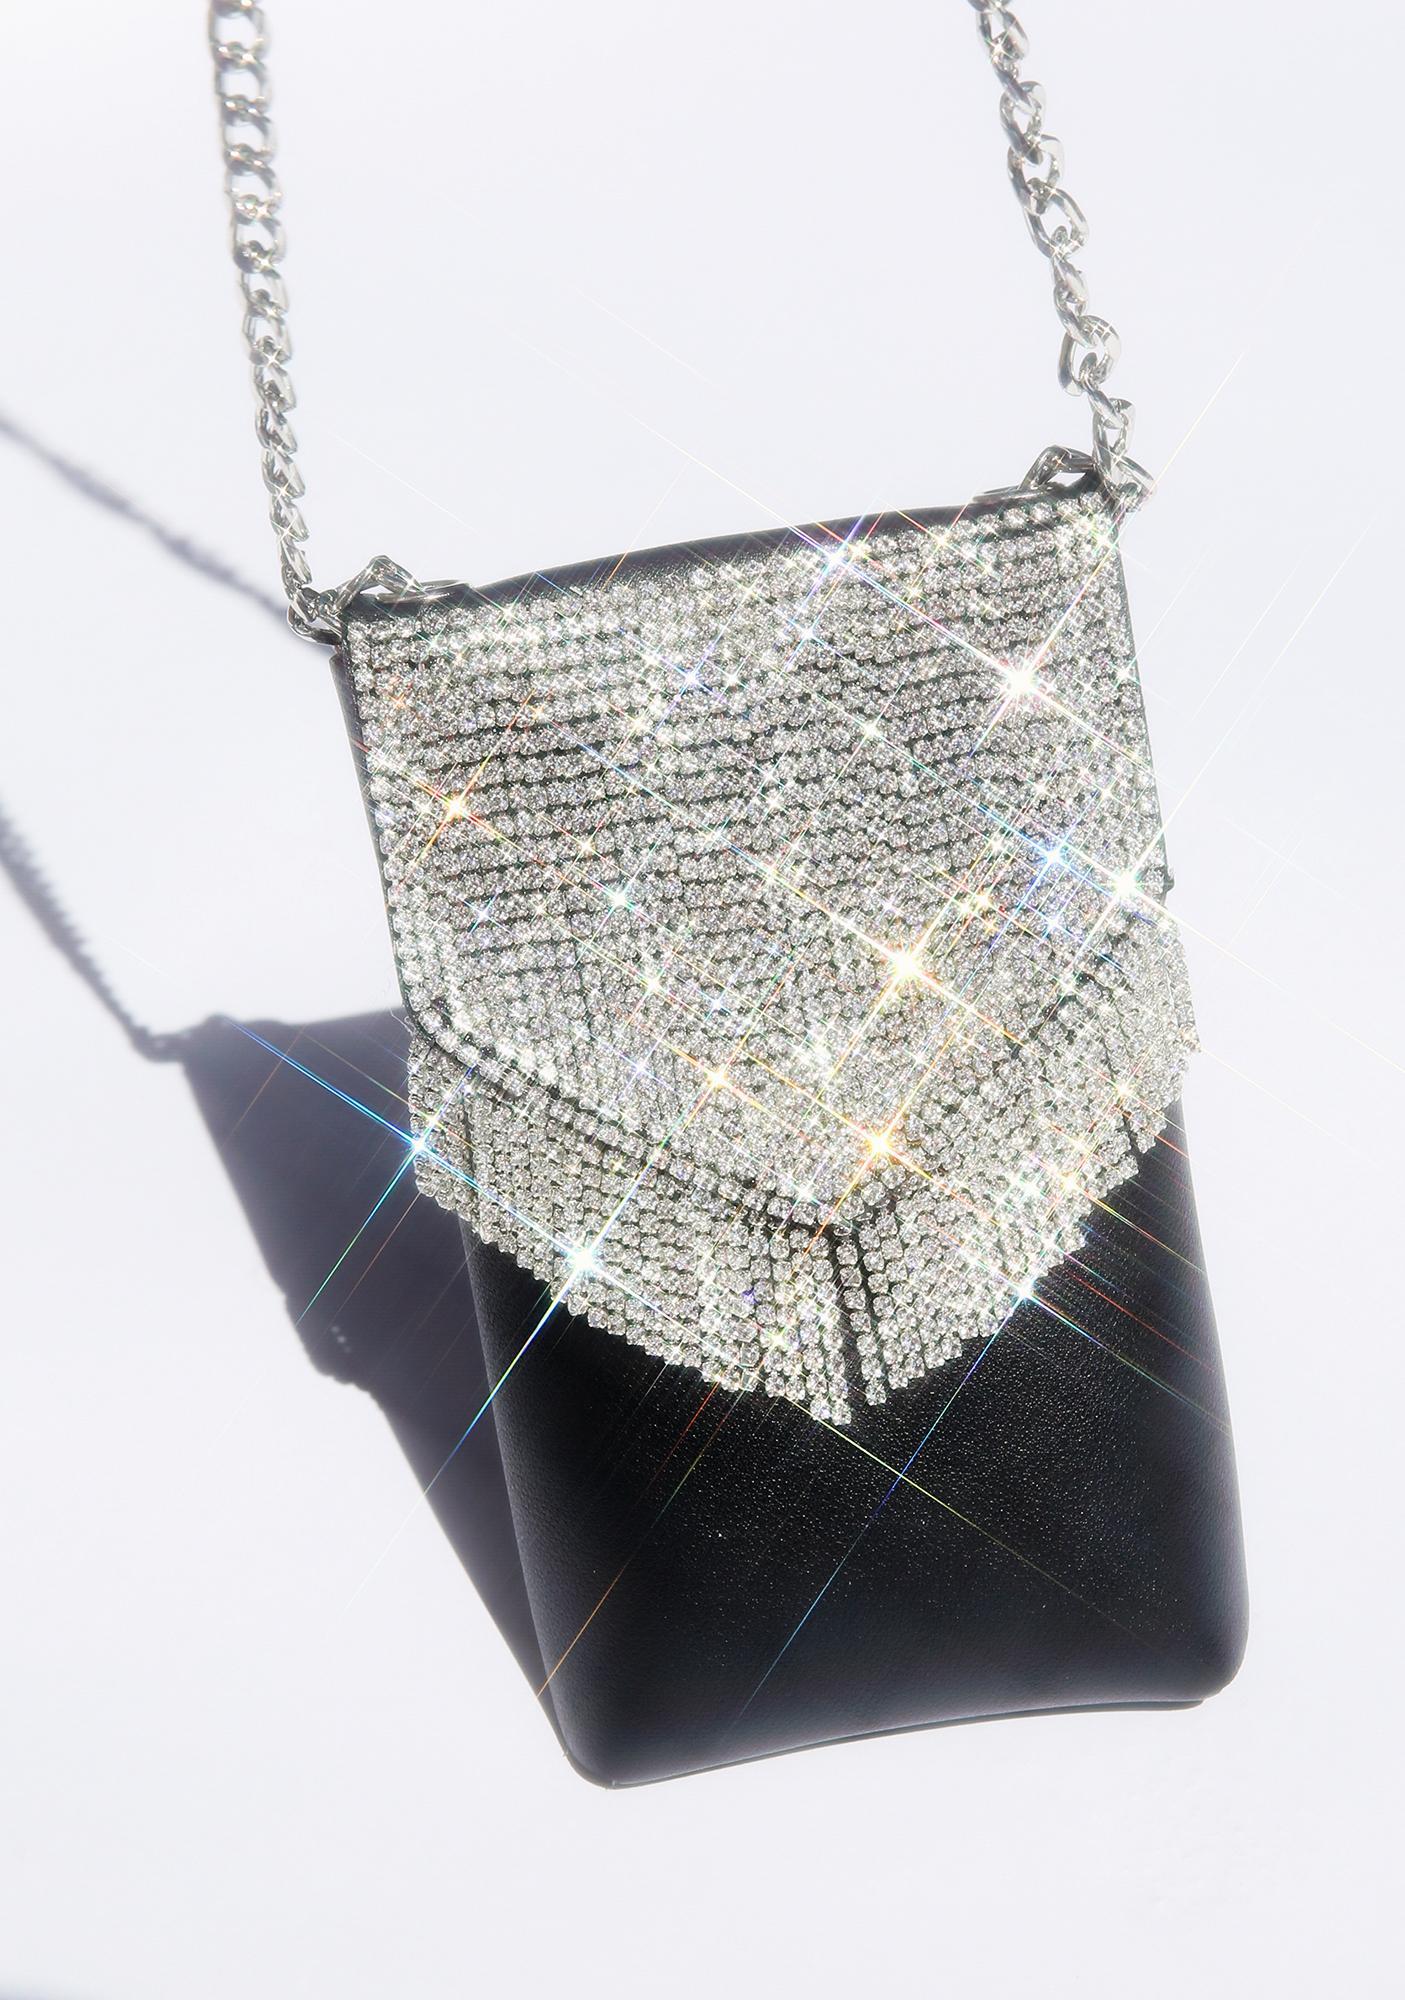 Made Of Money Belt Bag